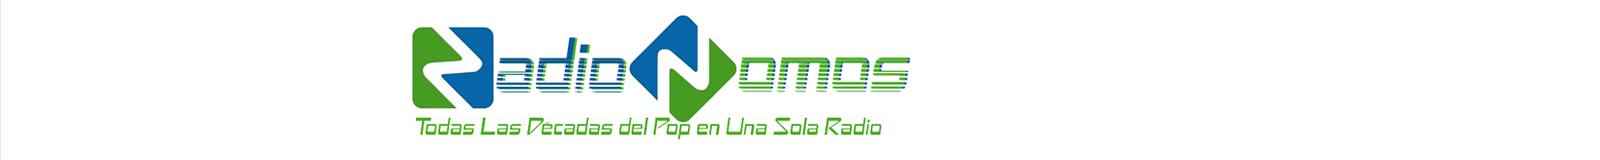 RadioNomos